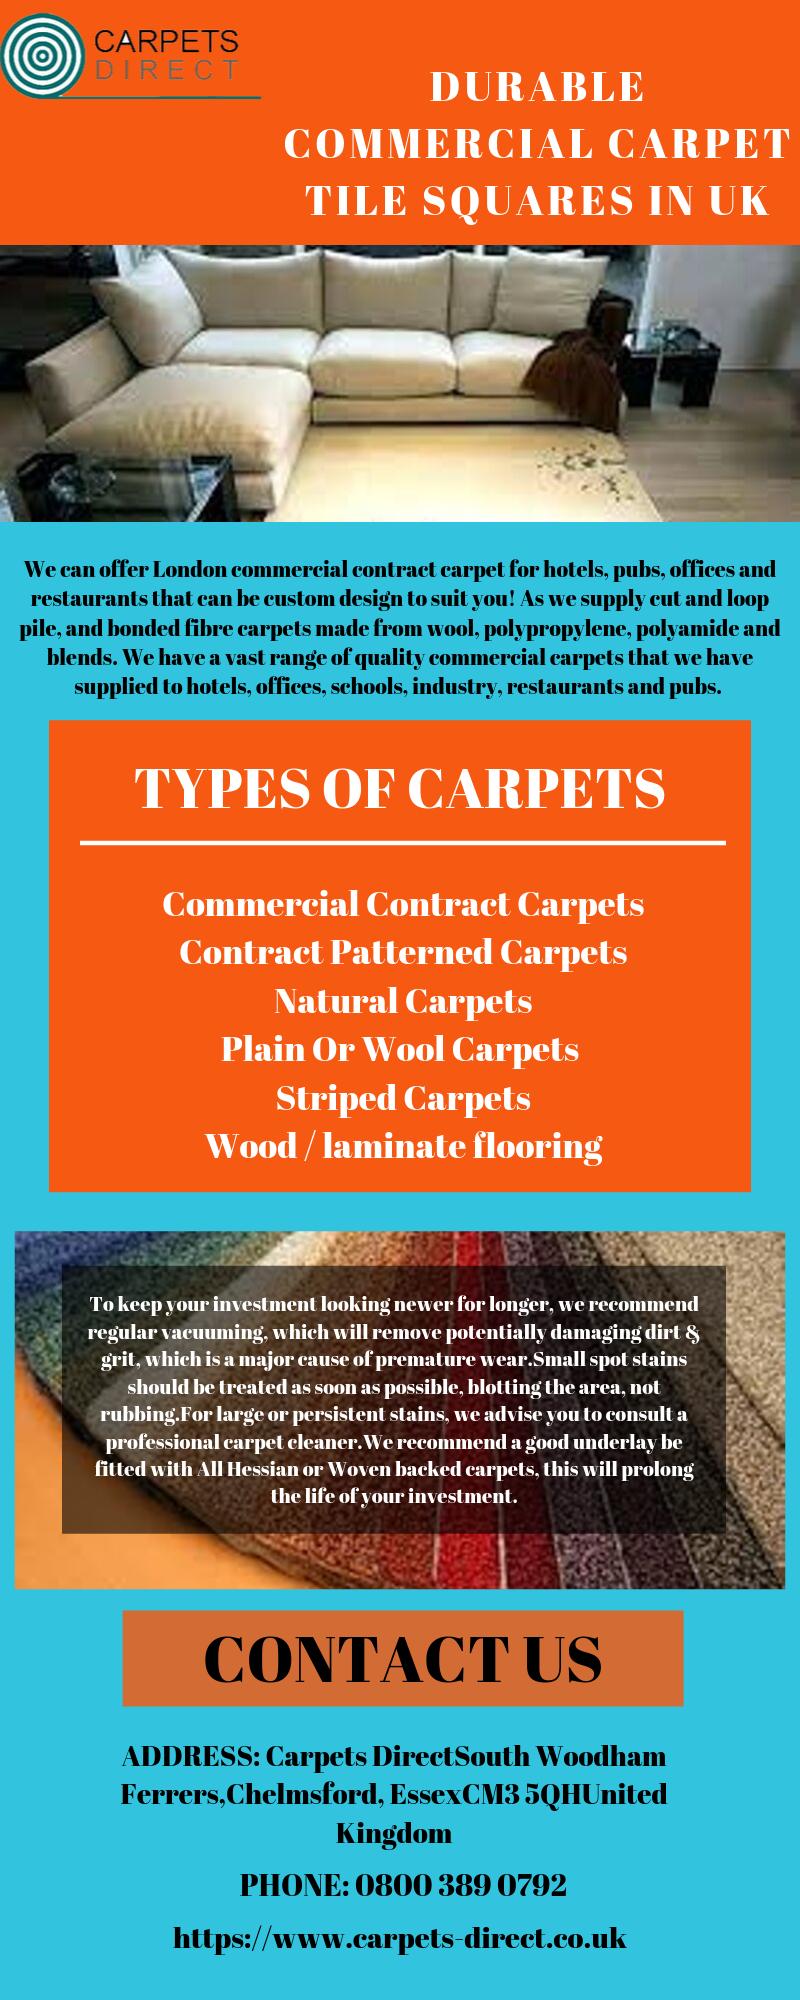 Durable Commercial Carpet Tile Squares In Uk Commercial Carpet Carpet Tiles Commercial Carpet Tiles